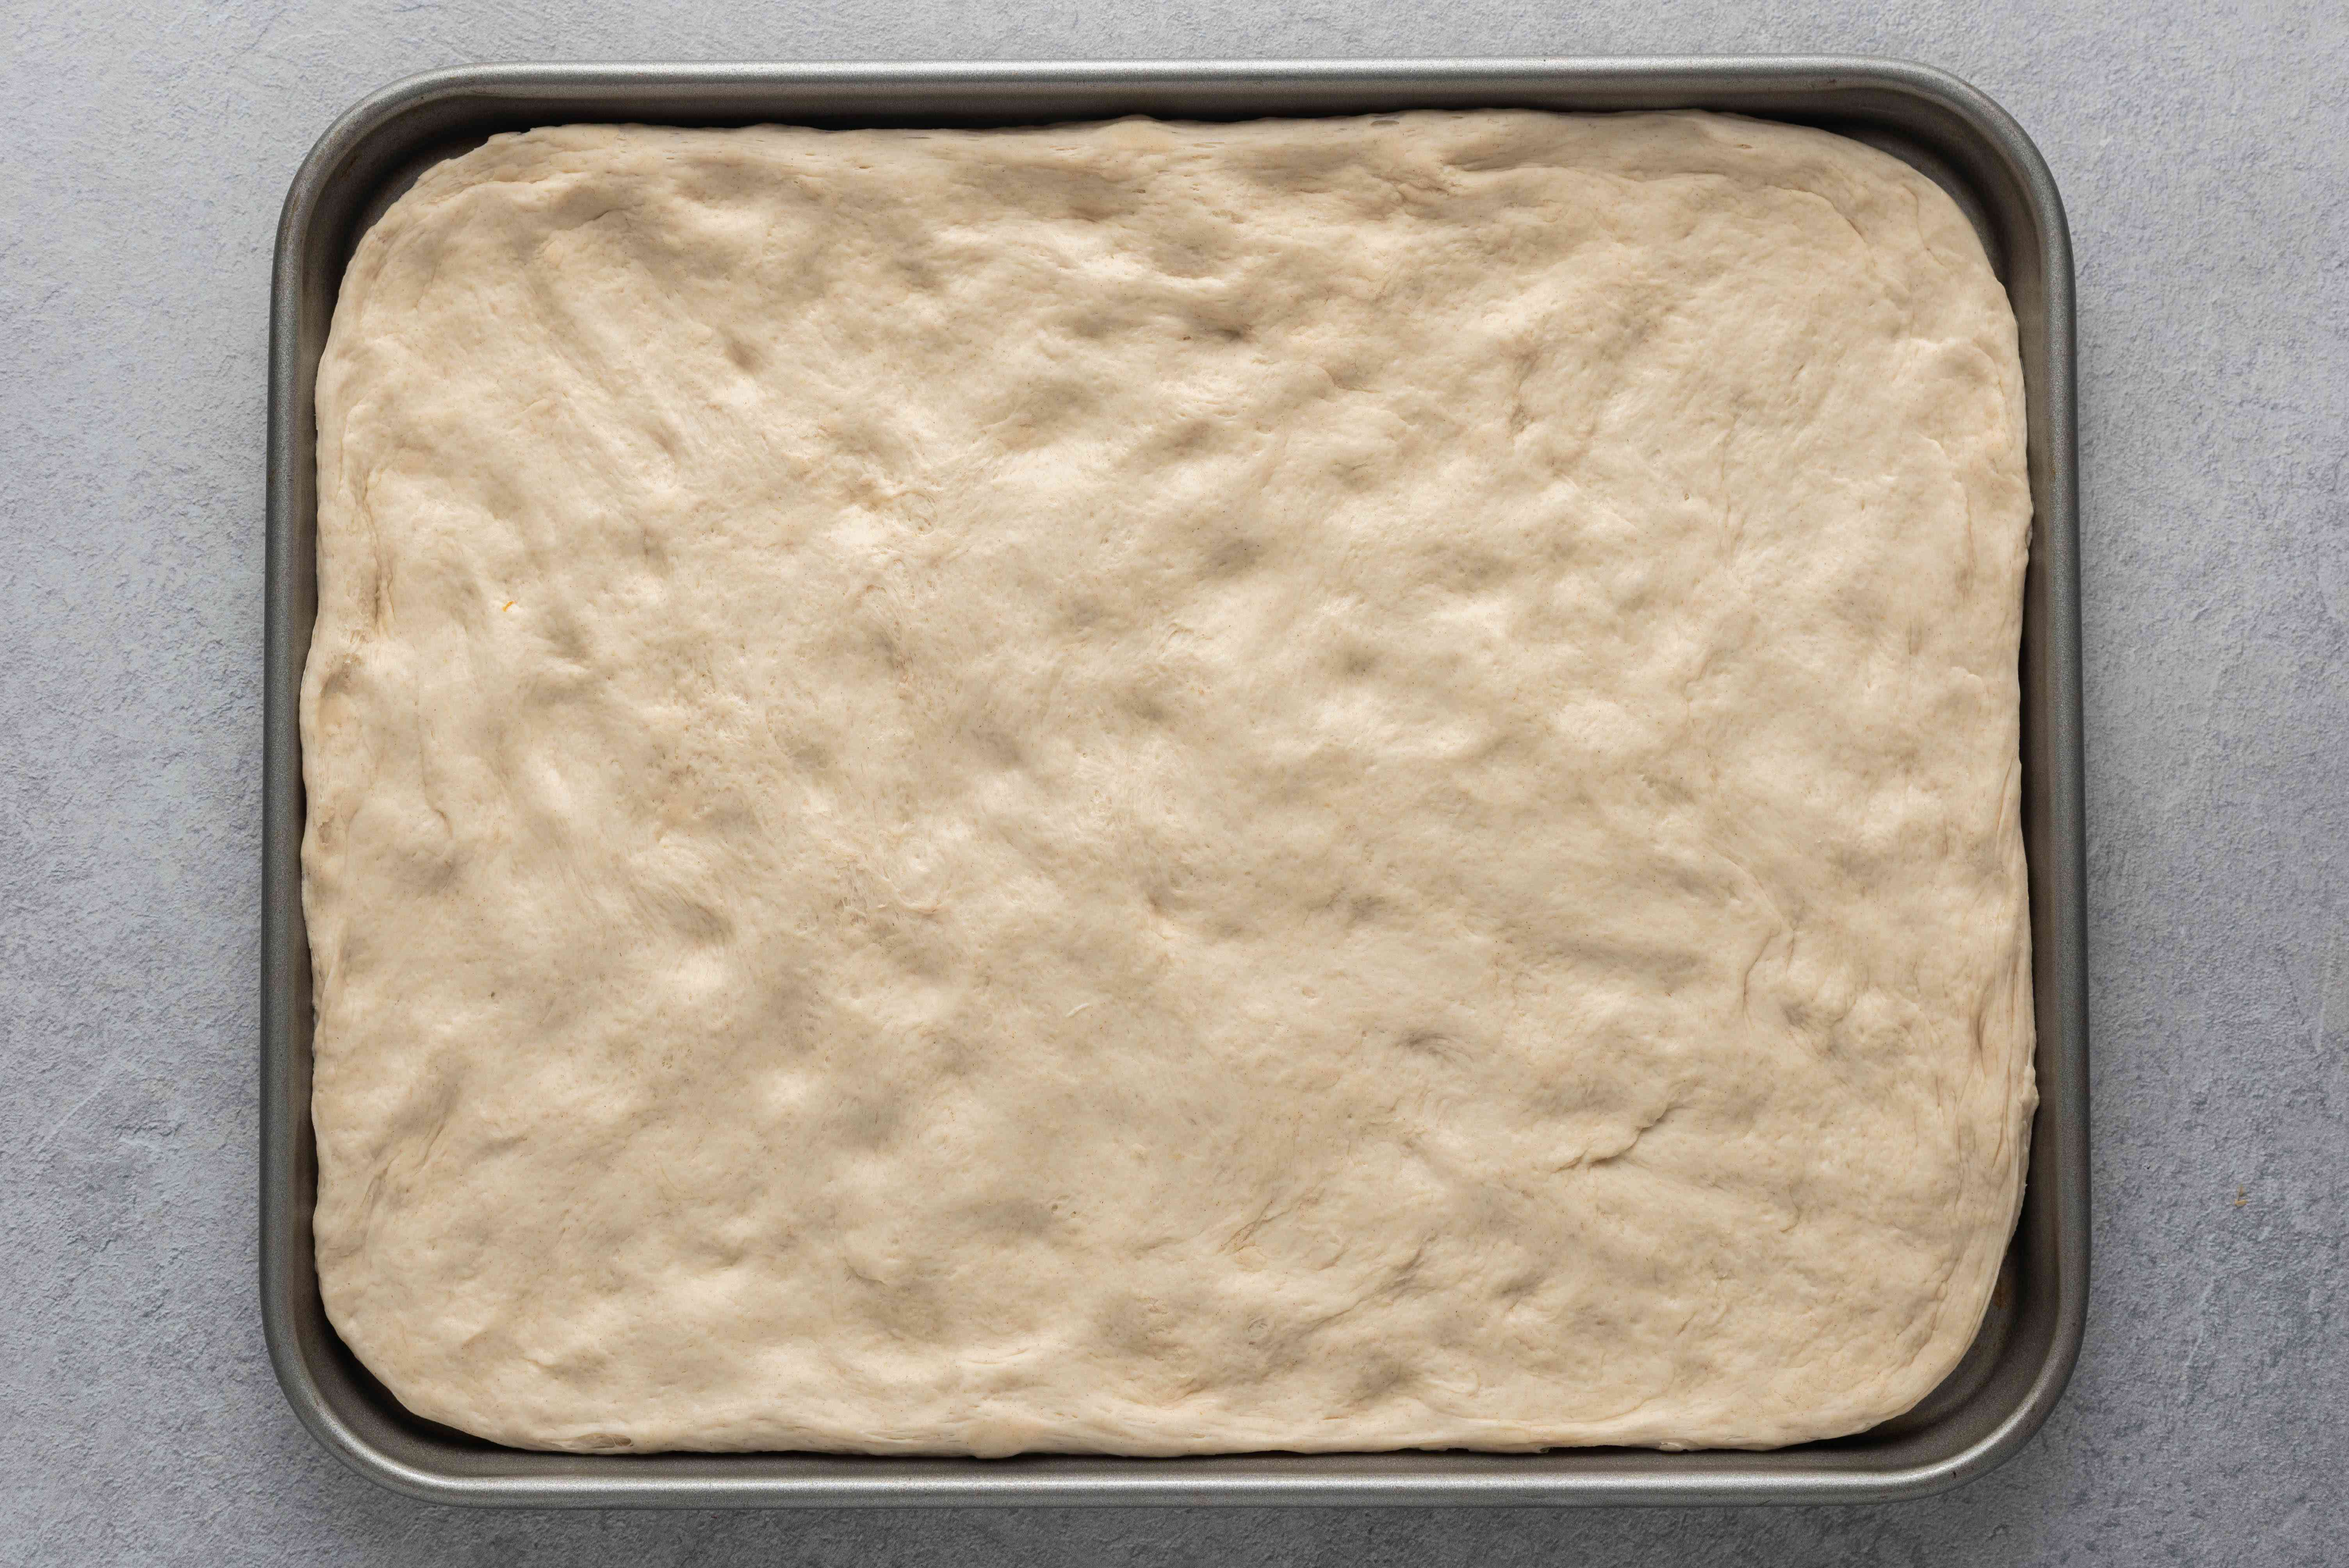 pizza dough on a baking sheet